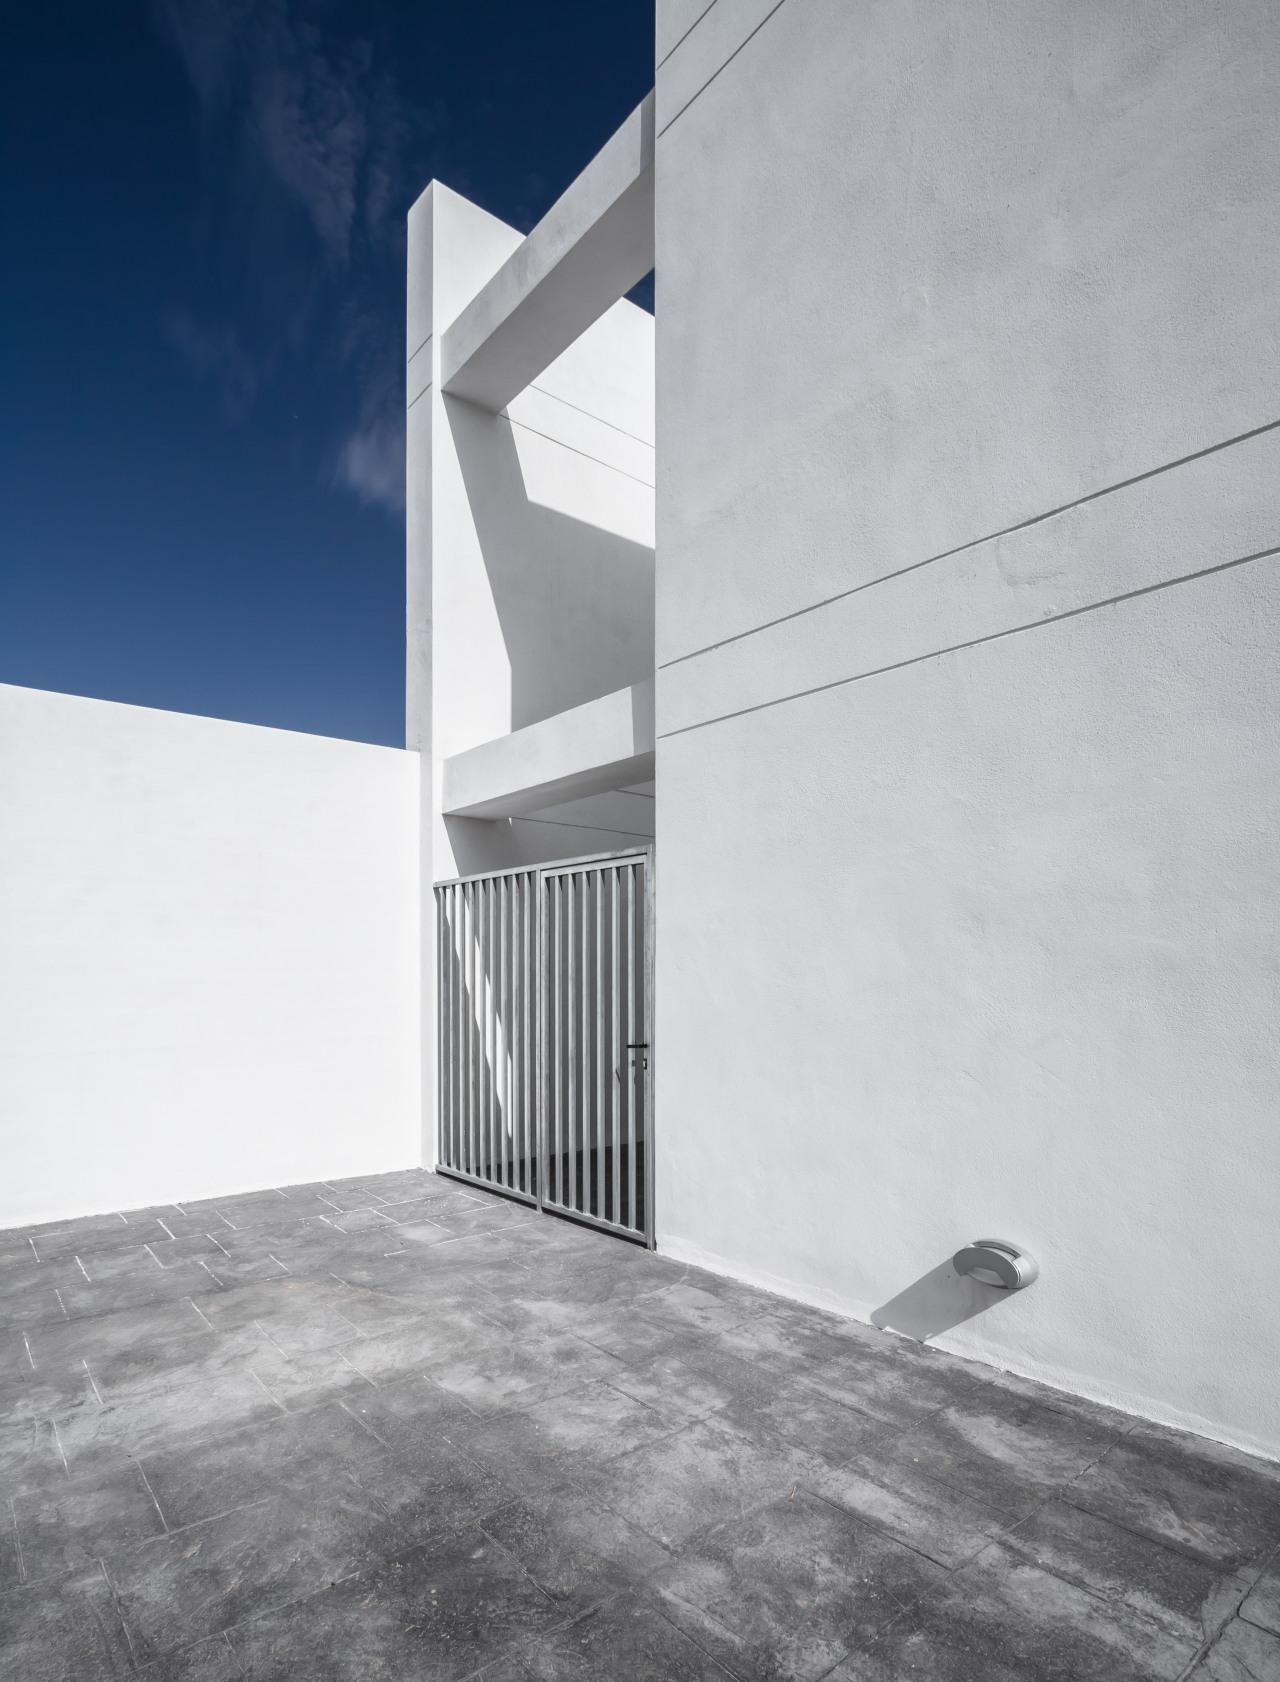 fotografia-arquitectura-valencia-german-cabo-viraje-sagunto (8)